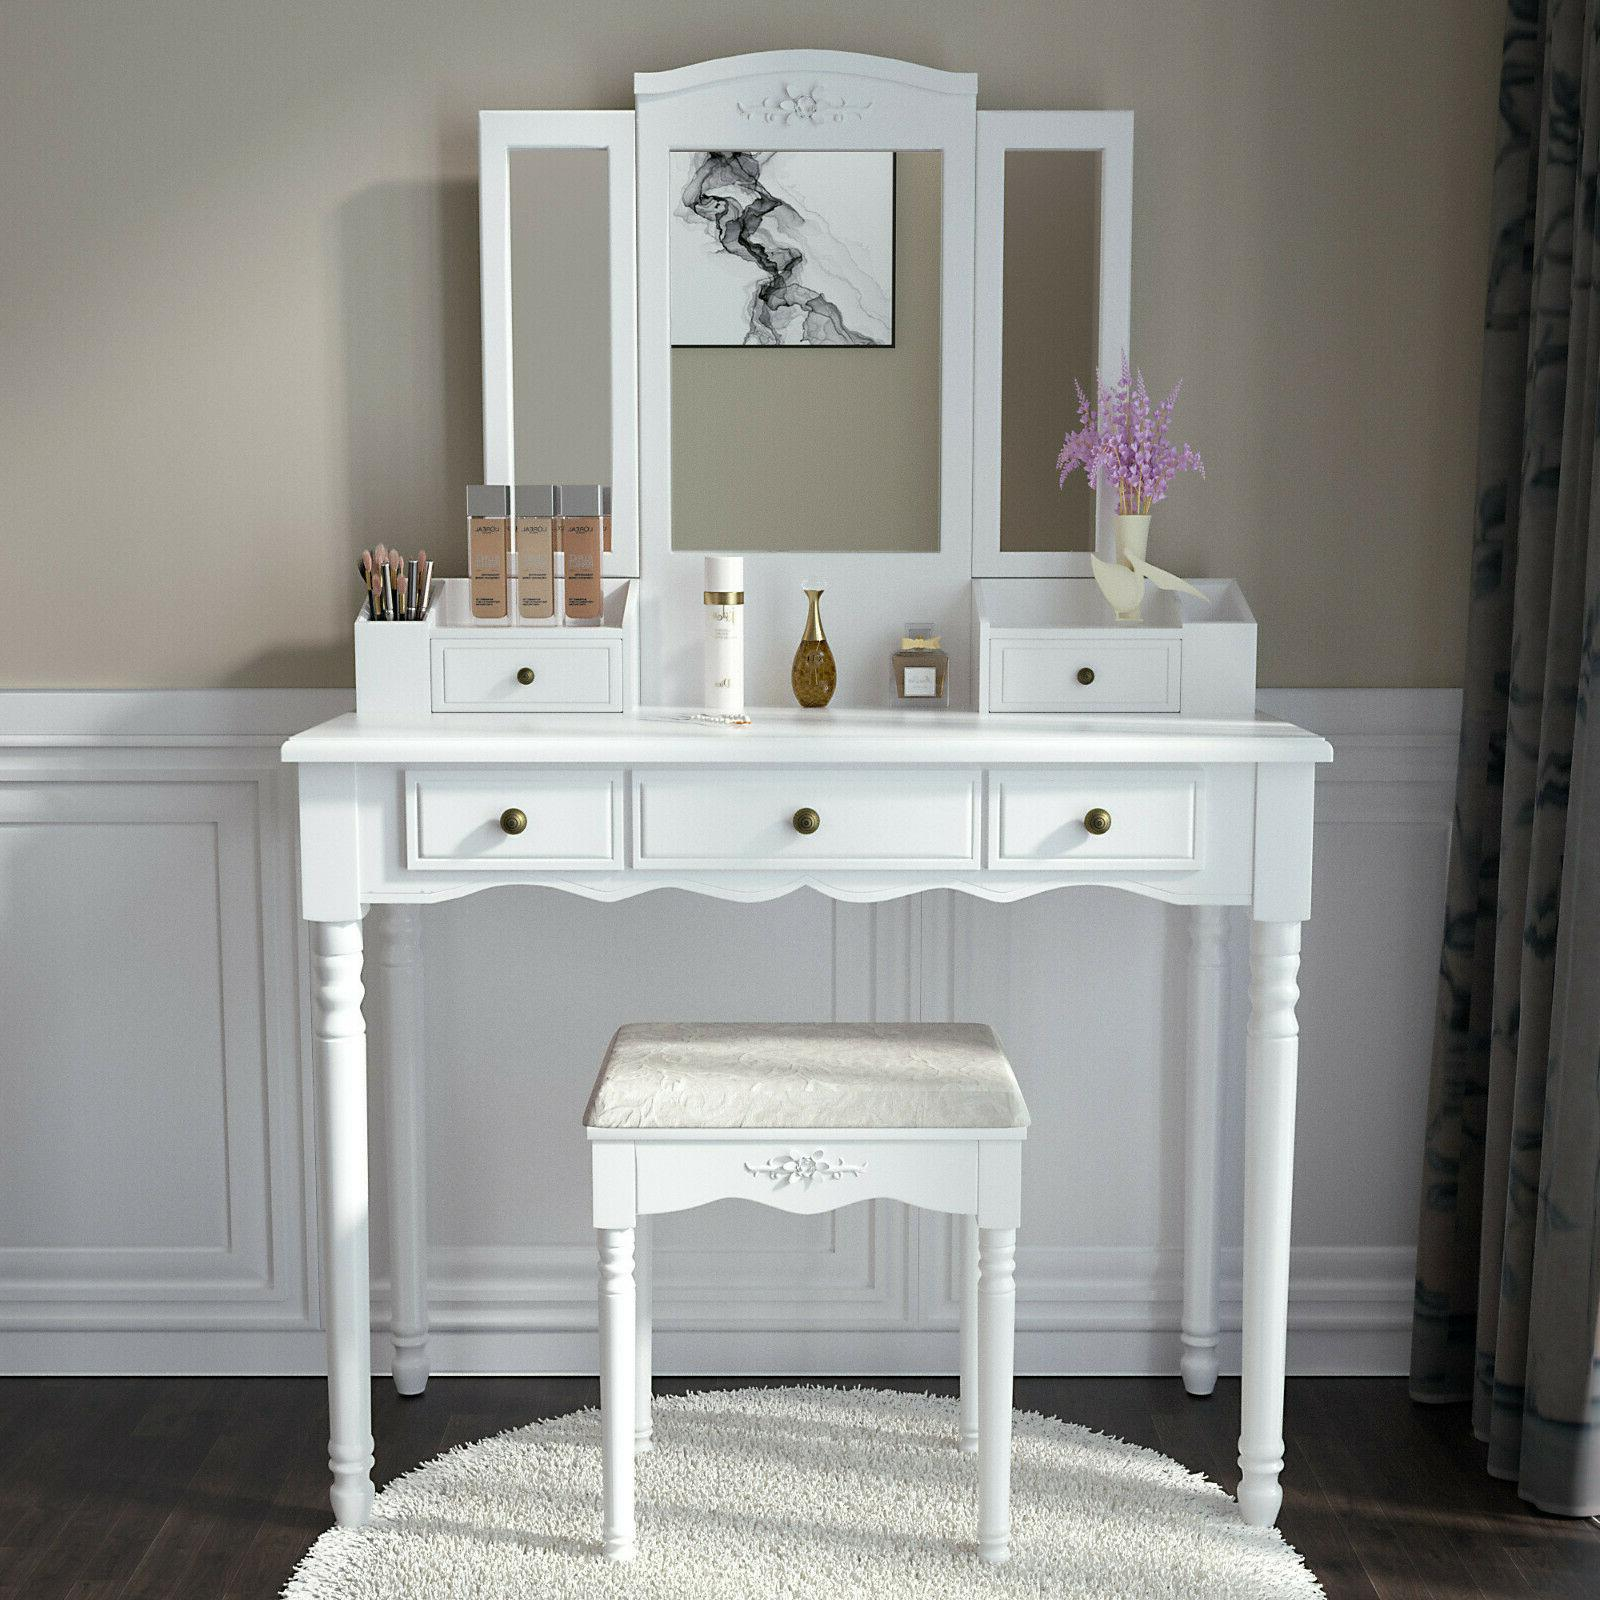 3 mirrors 5 drawers vanity makeup table